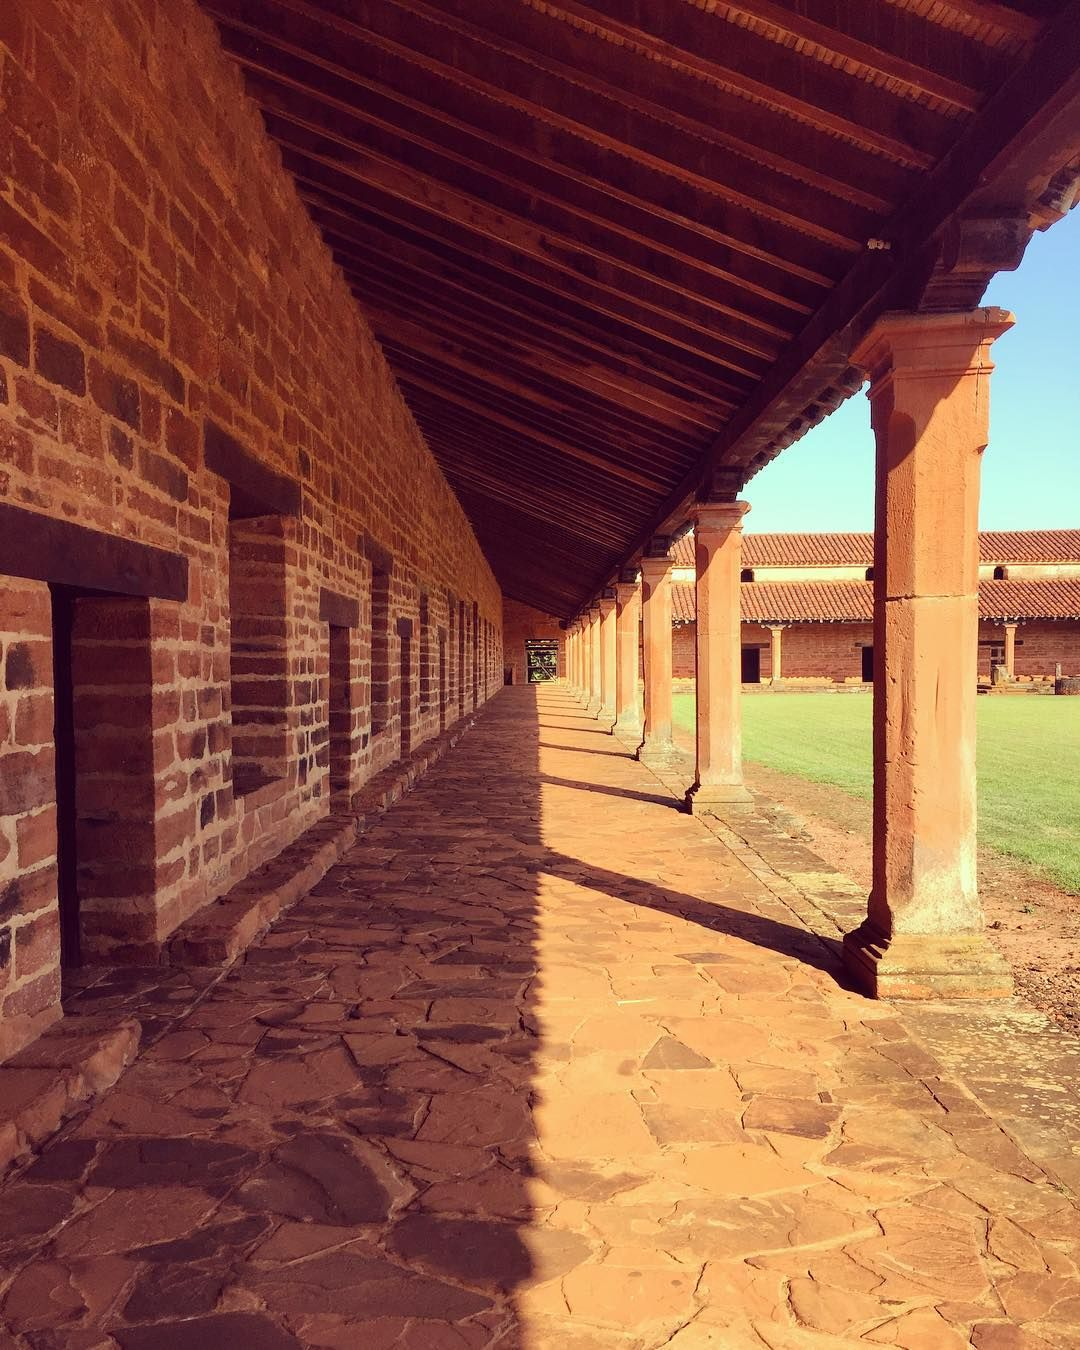 San Cosme Y Damian Paraguay By Taisa Natalka Taisanatalka On Instagram South America Travel Beautiful Destinations Travel South